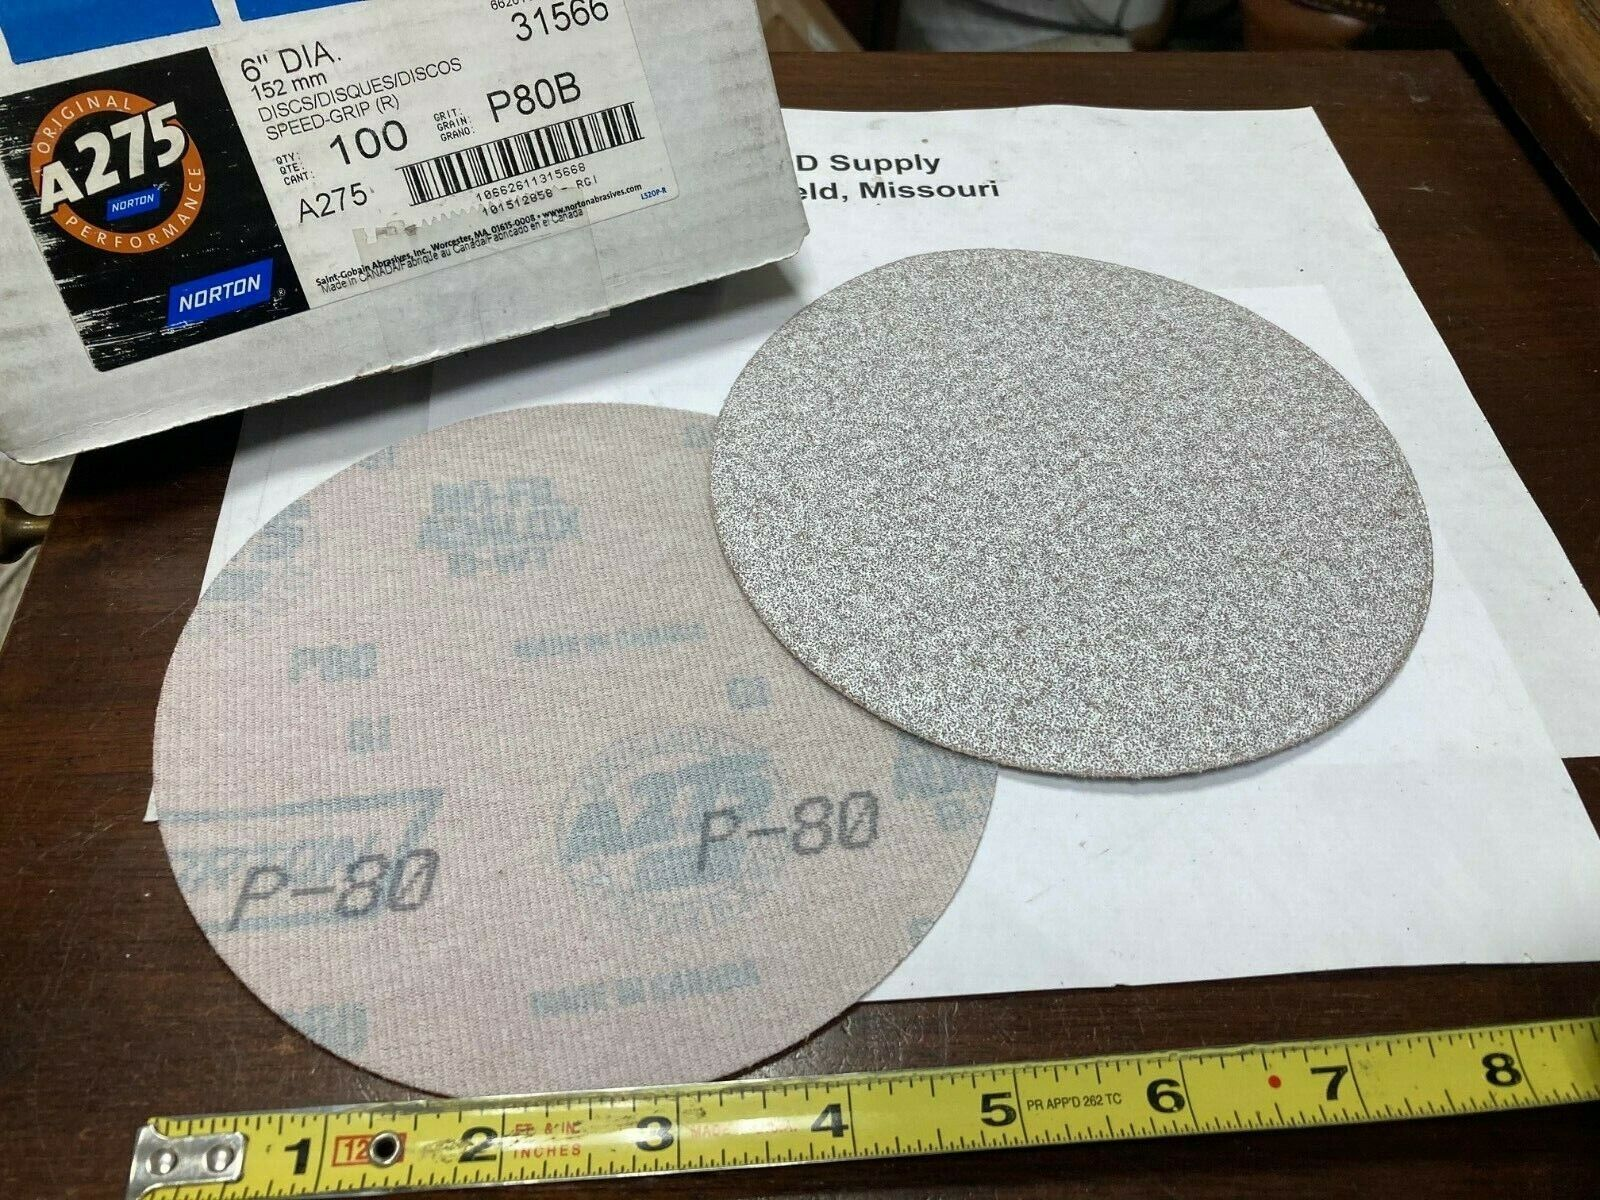 *** Box of 100 ***, Norton 66261131566, Sanding Discs, No Hole, 6